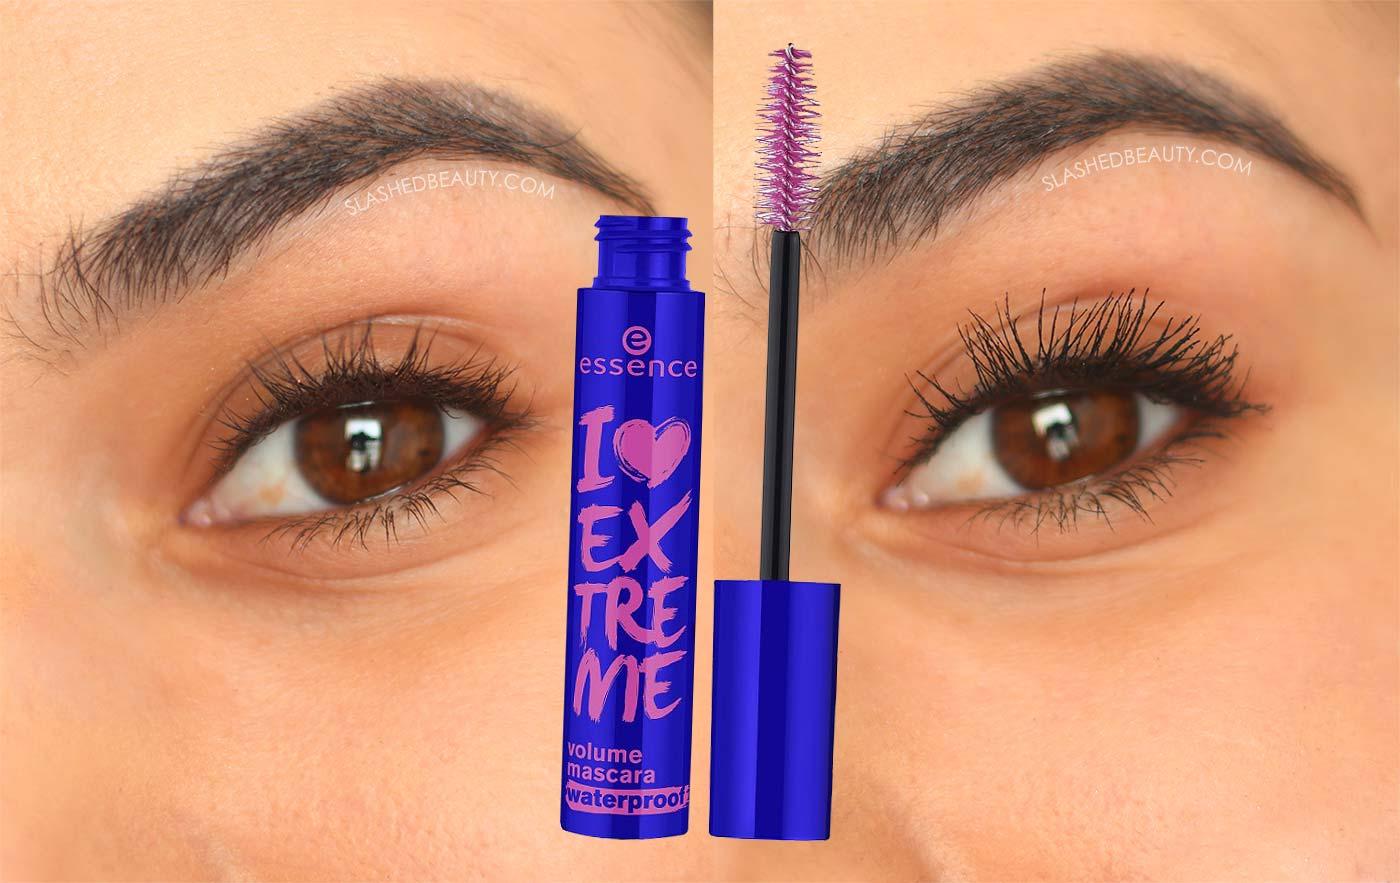 essence I Love Extreme Volume Mascara Before & After| NARS Climax Mascara Dupe | Slashed Beauty